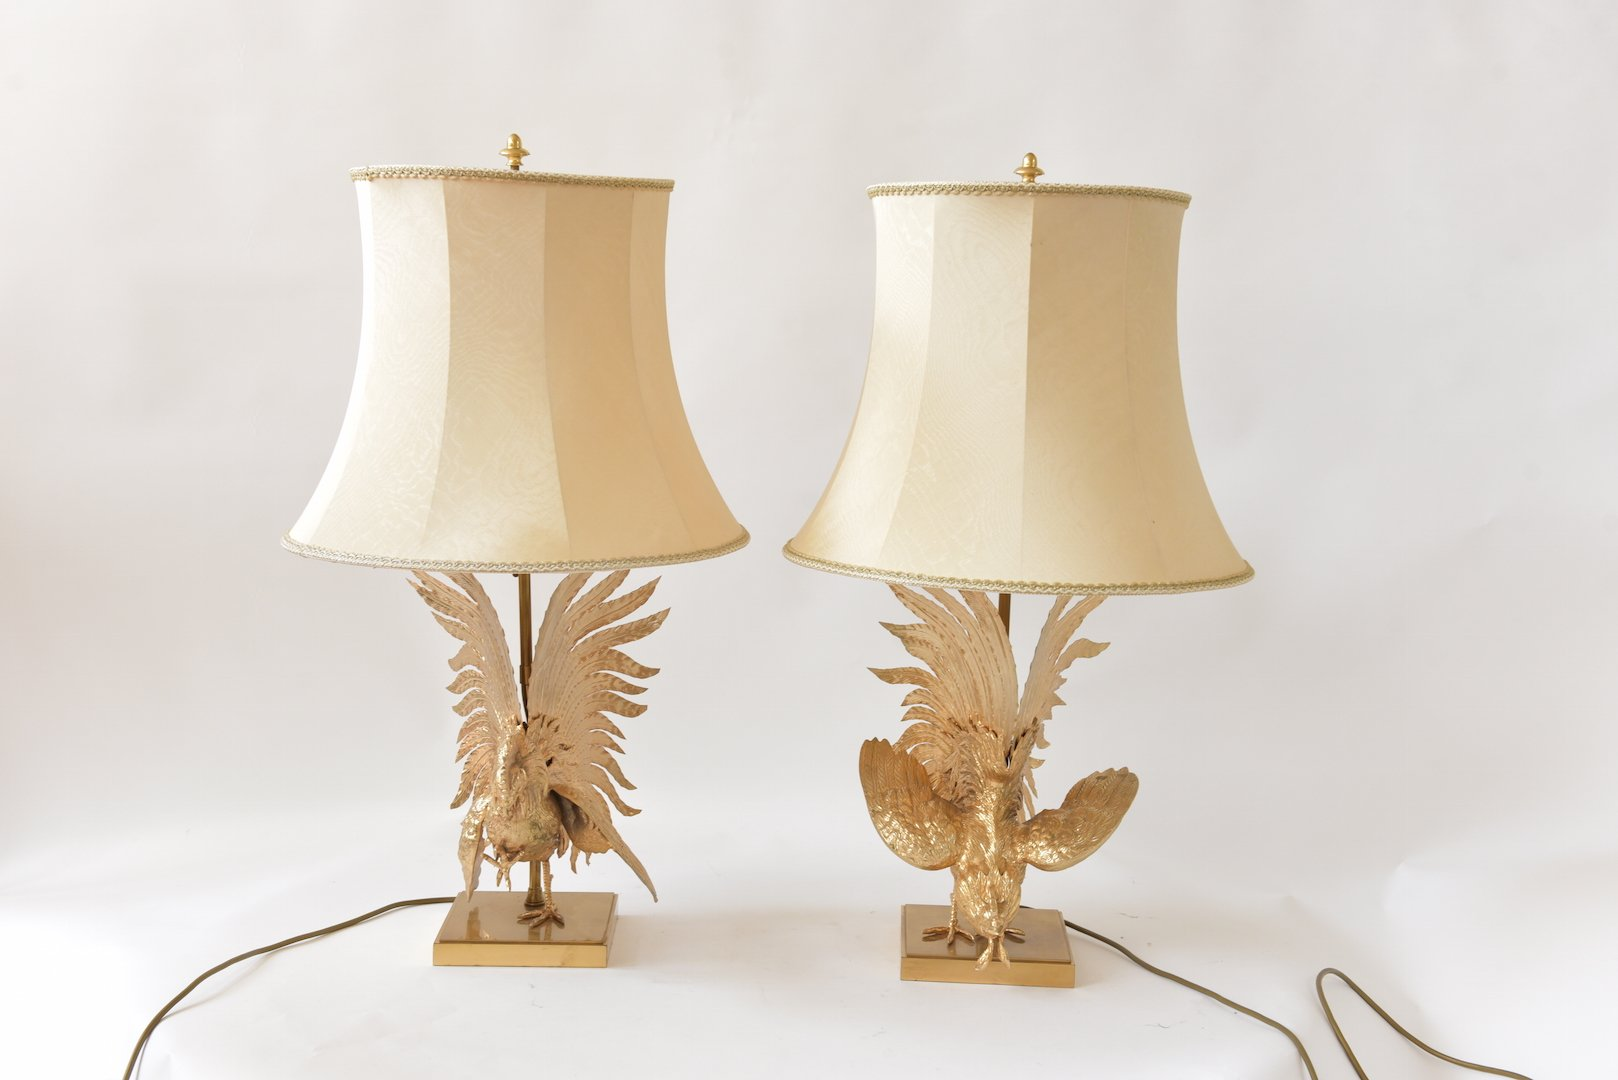 Vintage Gaulois Coqs Tischlampen, 2er Set